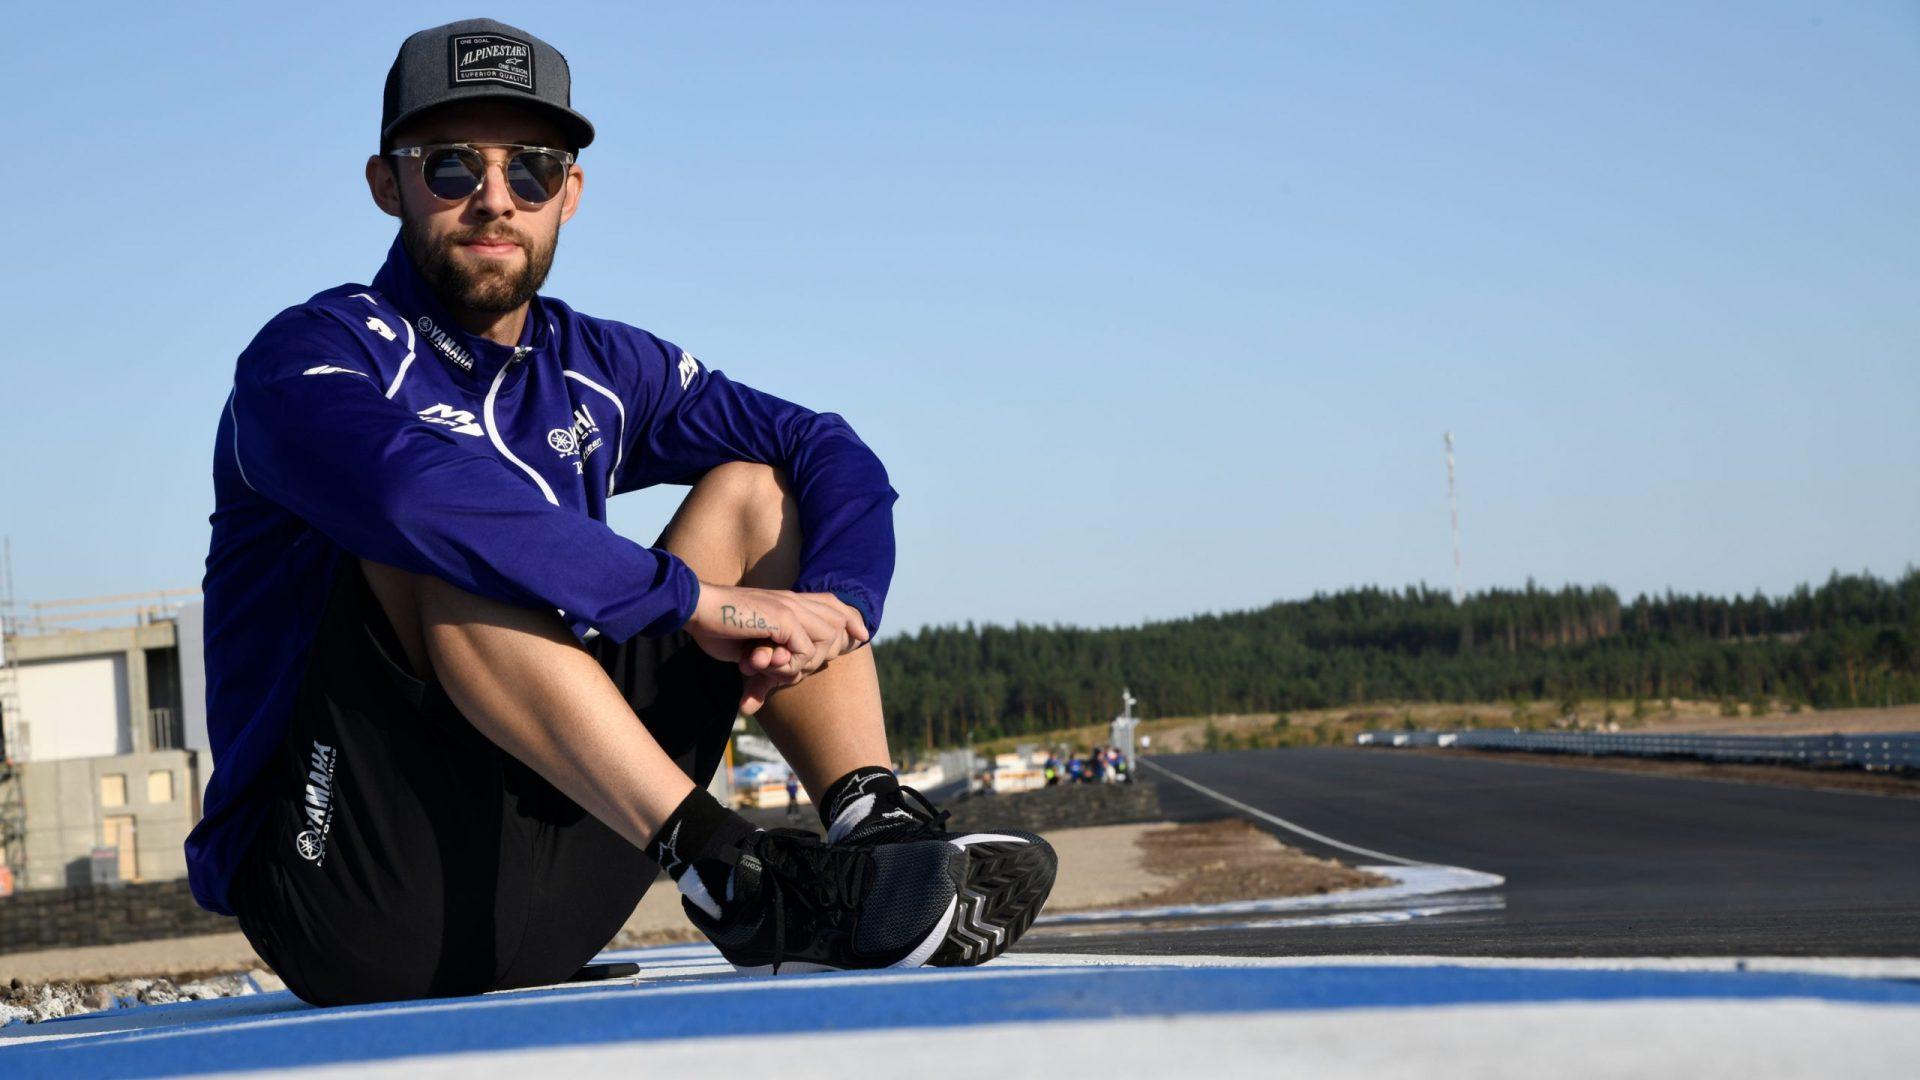 WorldSBK – Jonas Folger como Wildcard en la ronda catalana